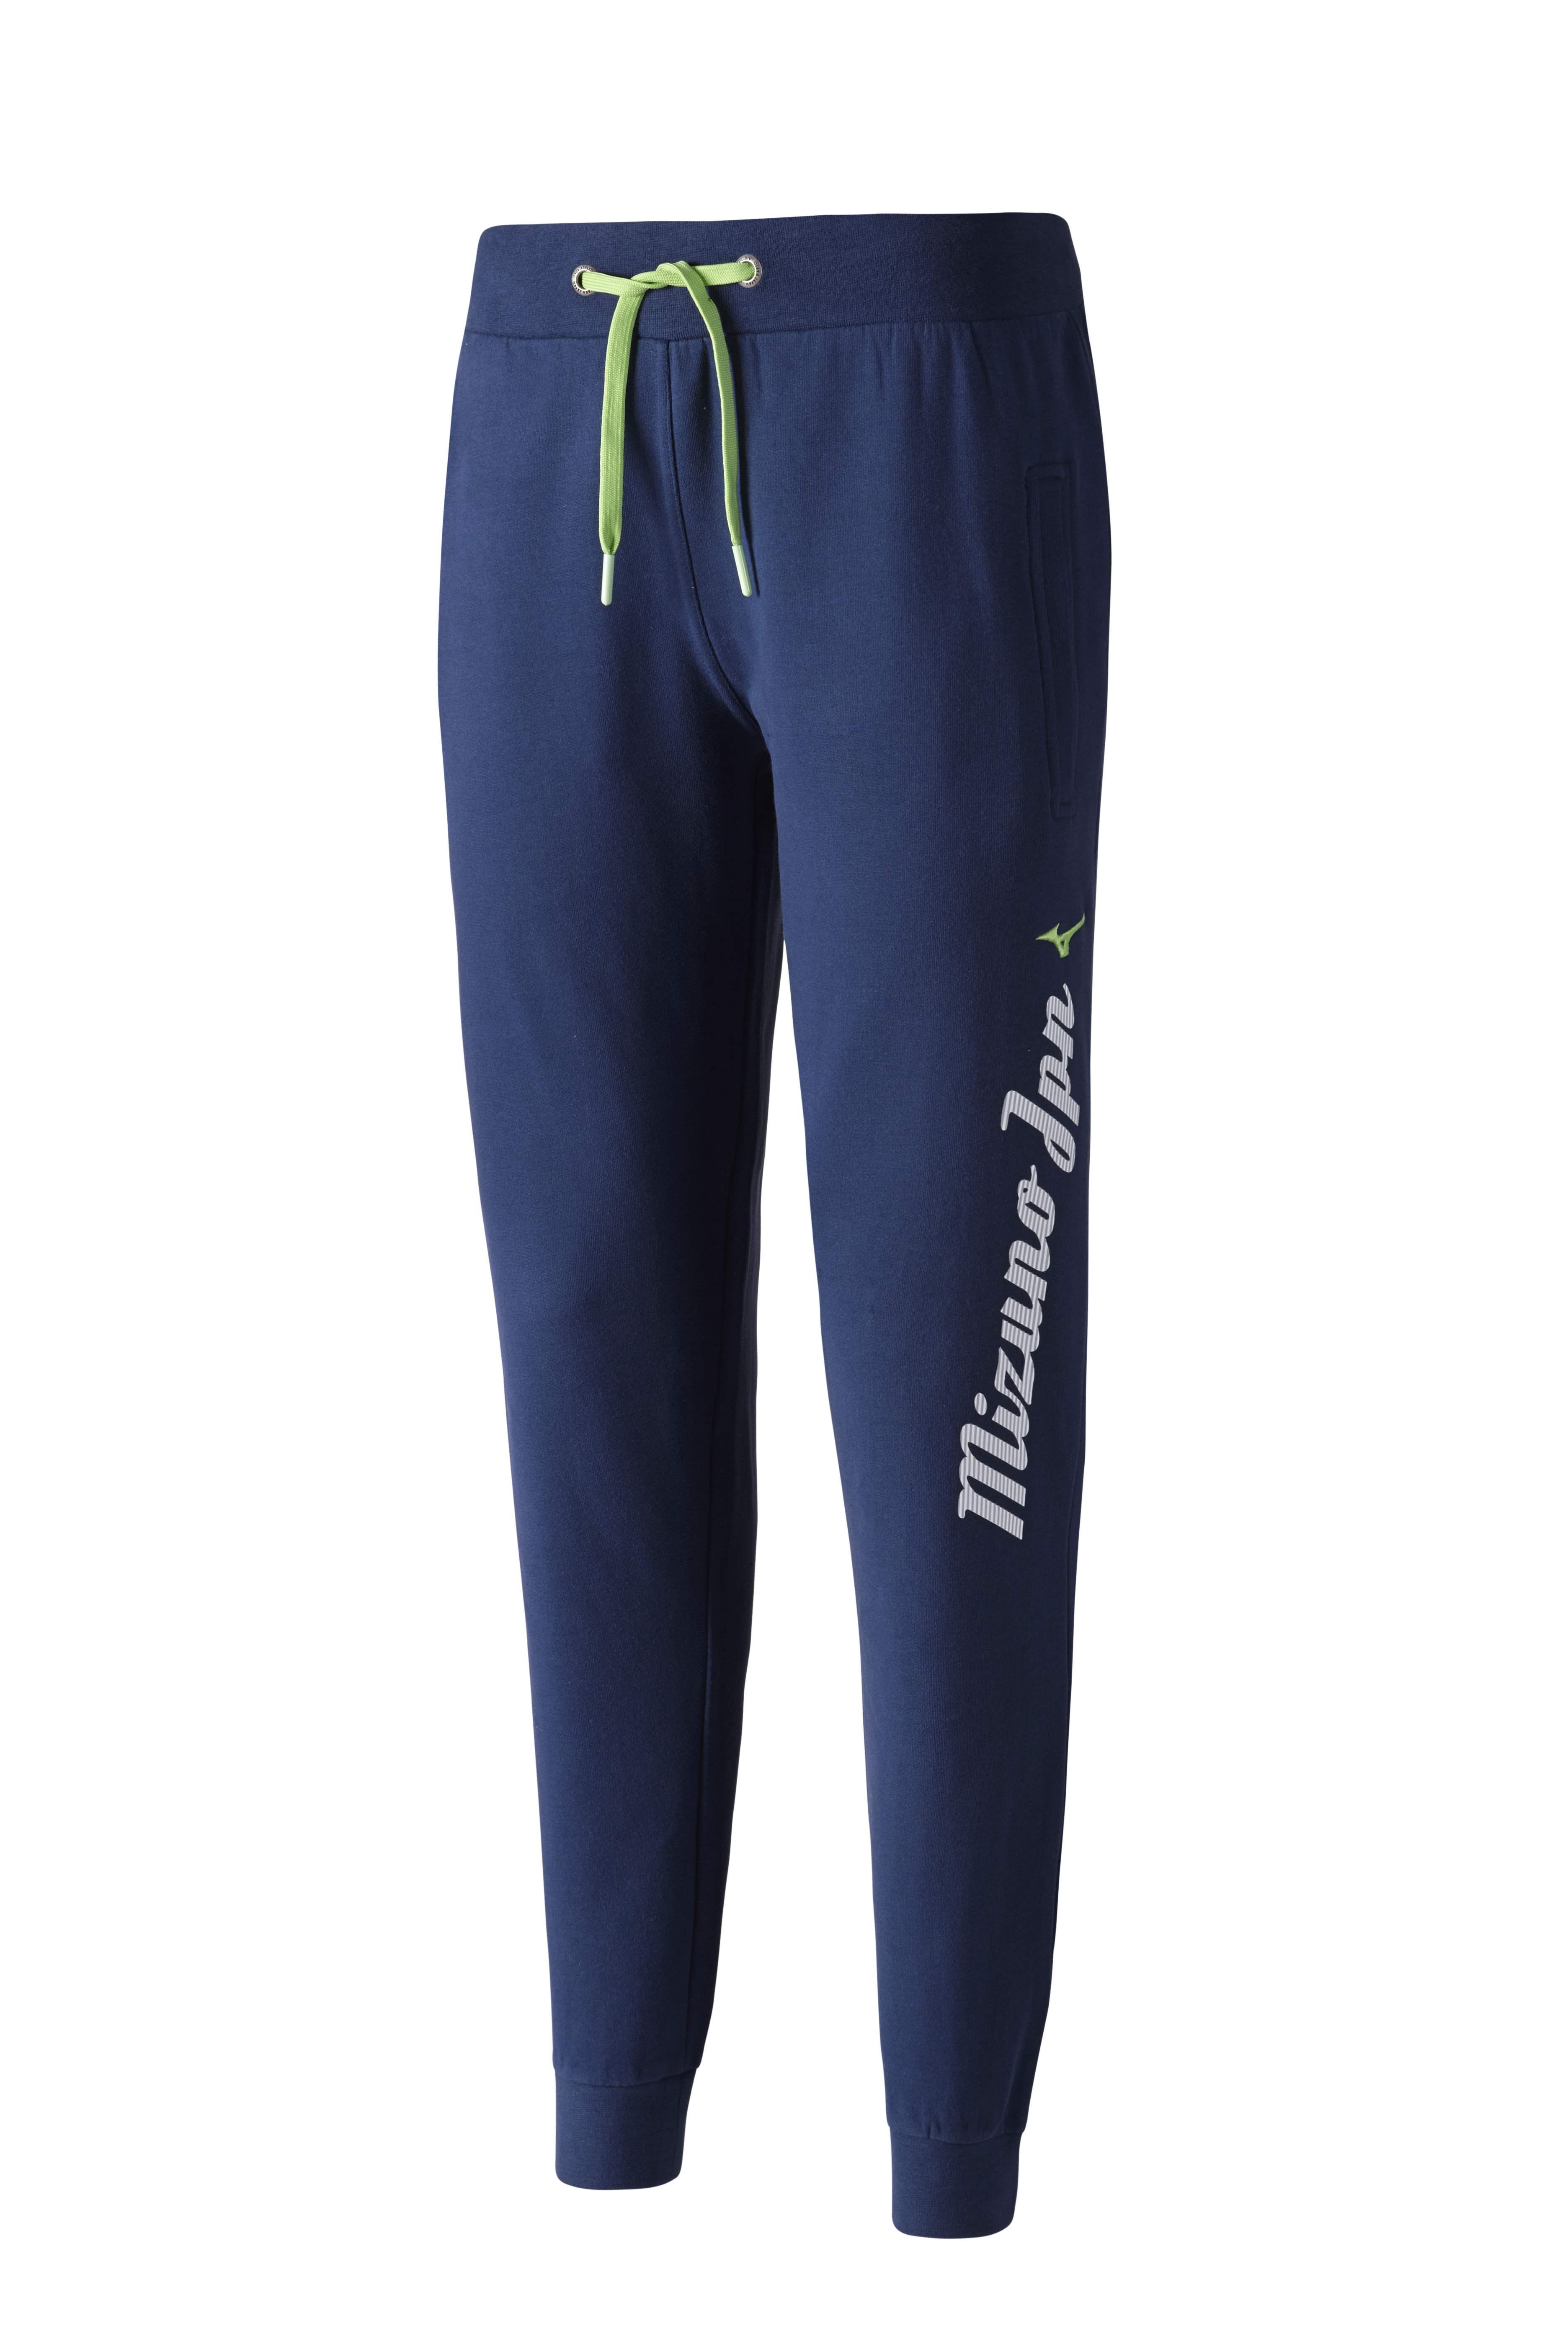 Mizuno Heritage Pants K2ED652014 L